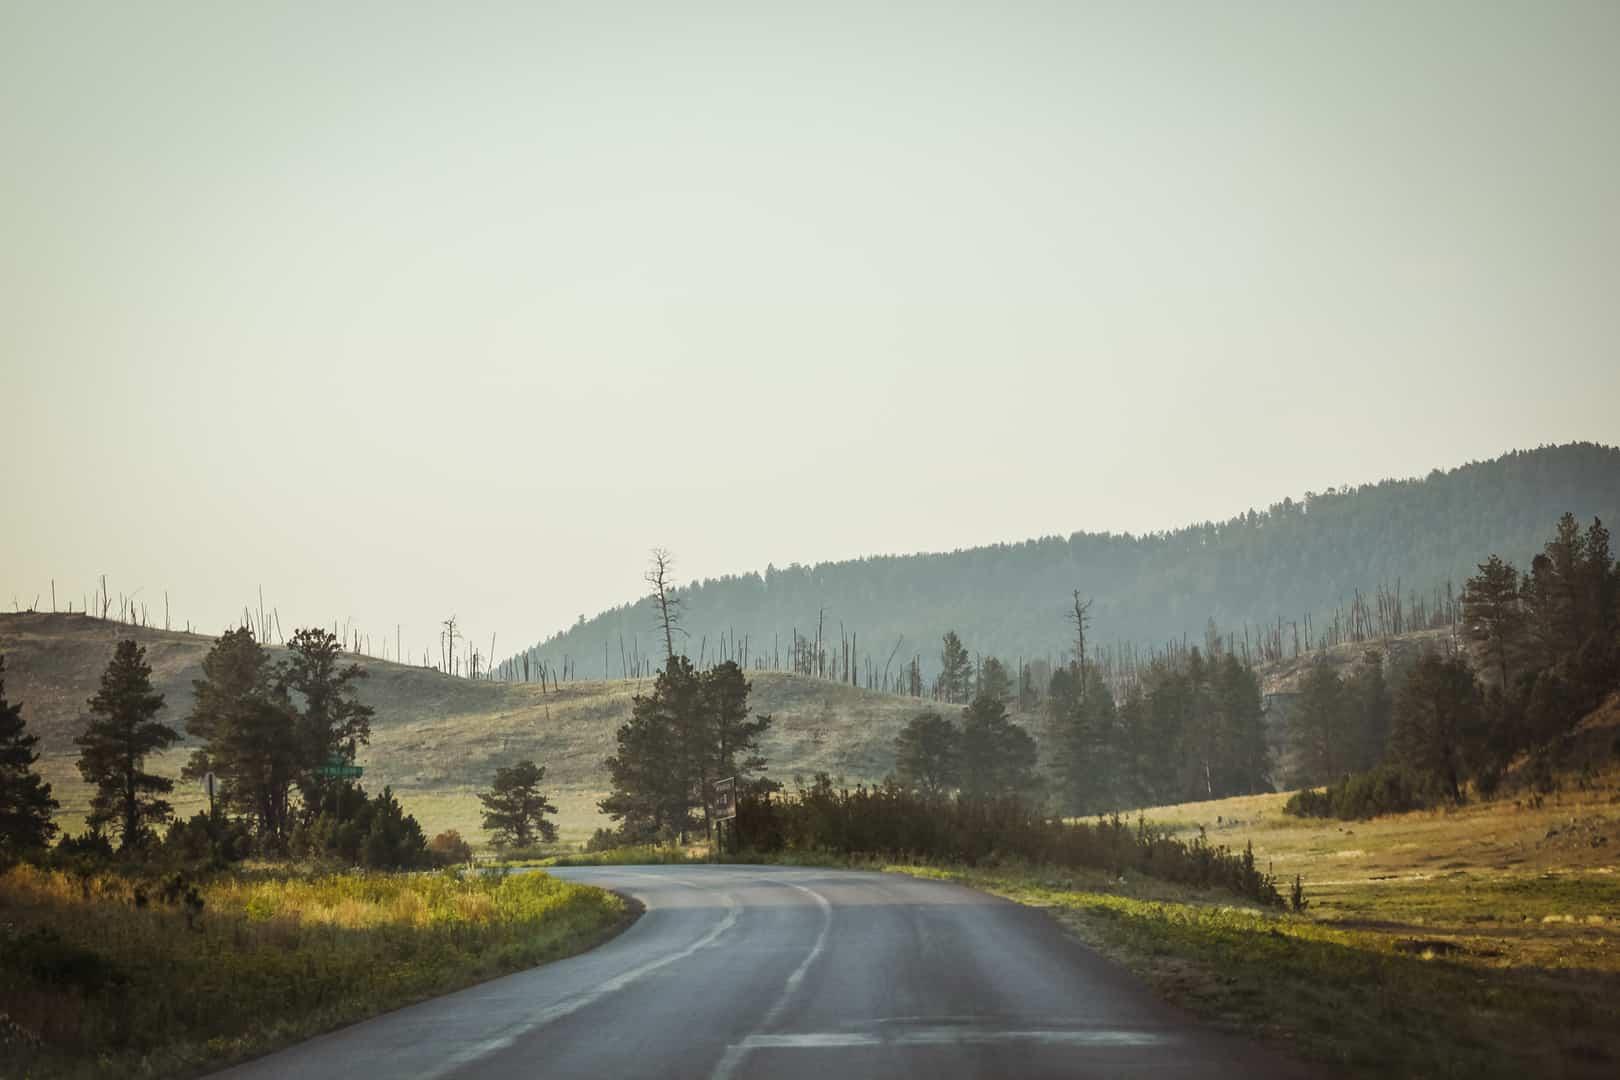 Enchanting views in Custer State Park, South Dakota